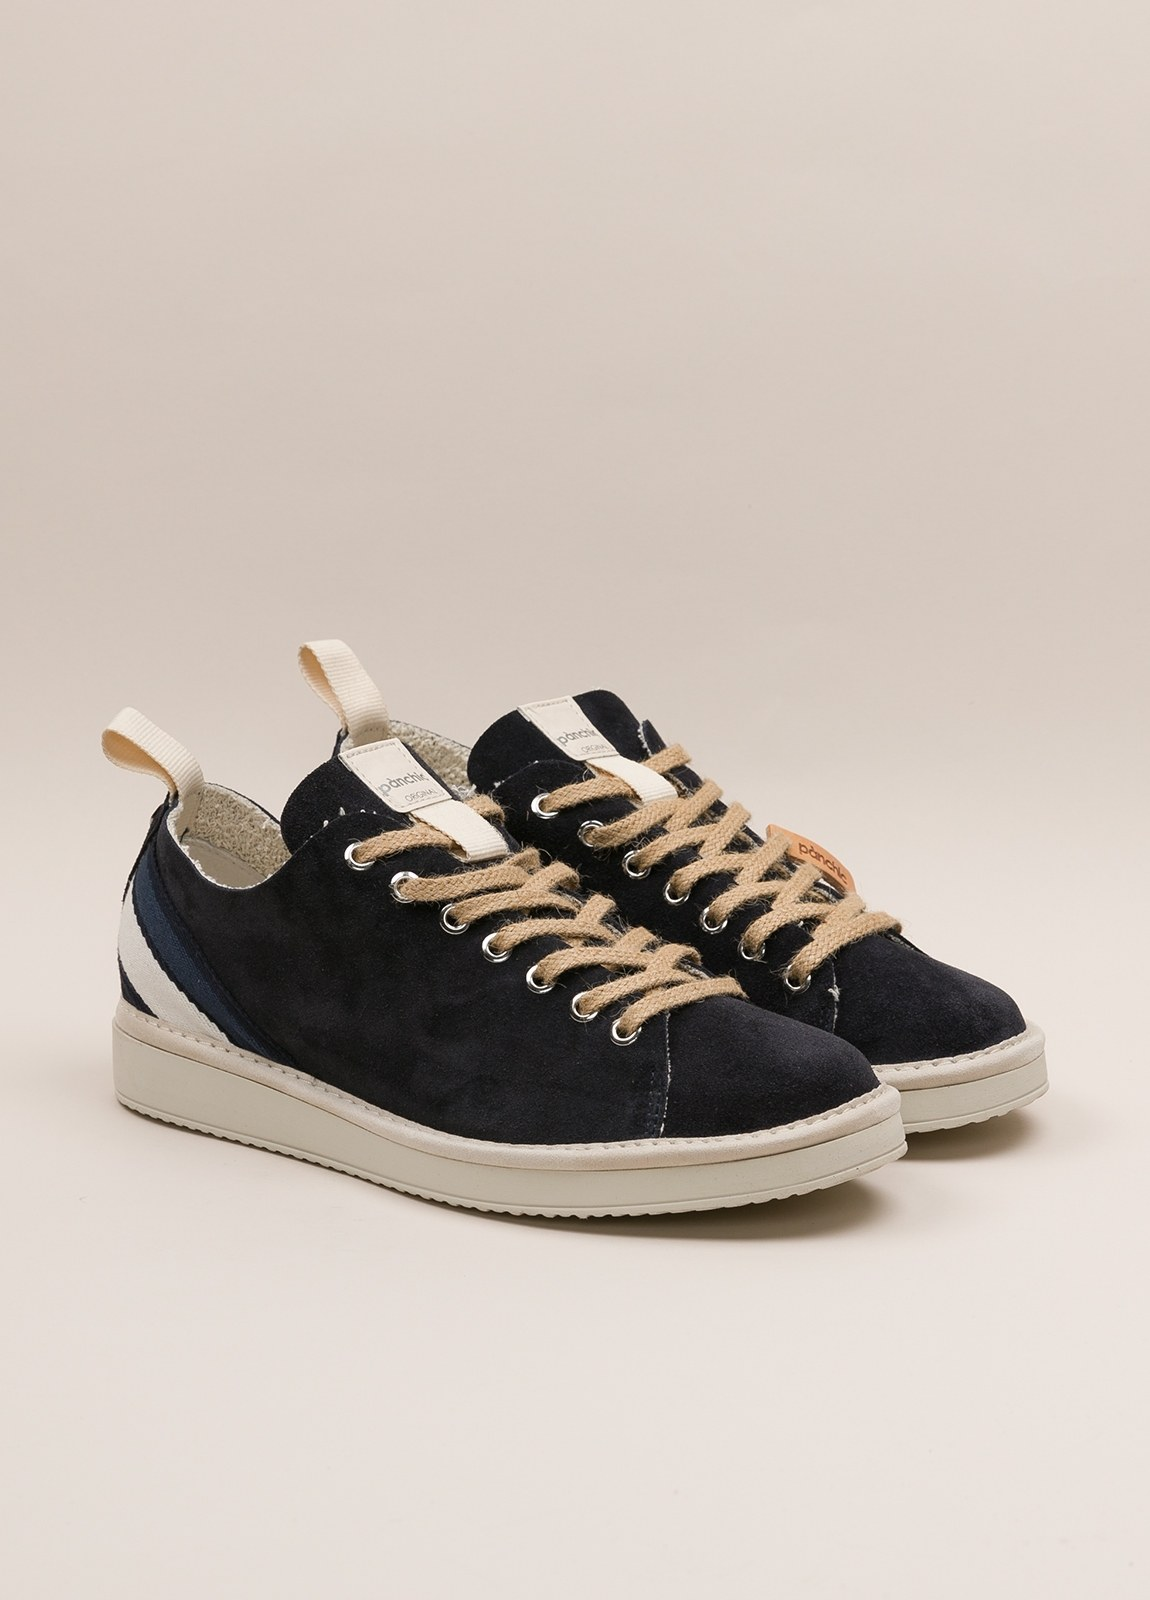 Sneakers PANCHIC marino - Ítem1